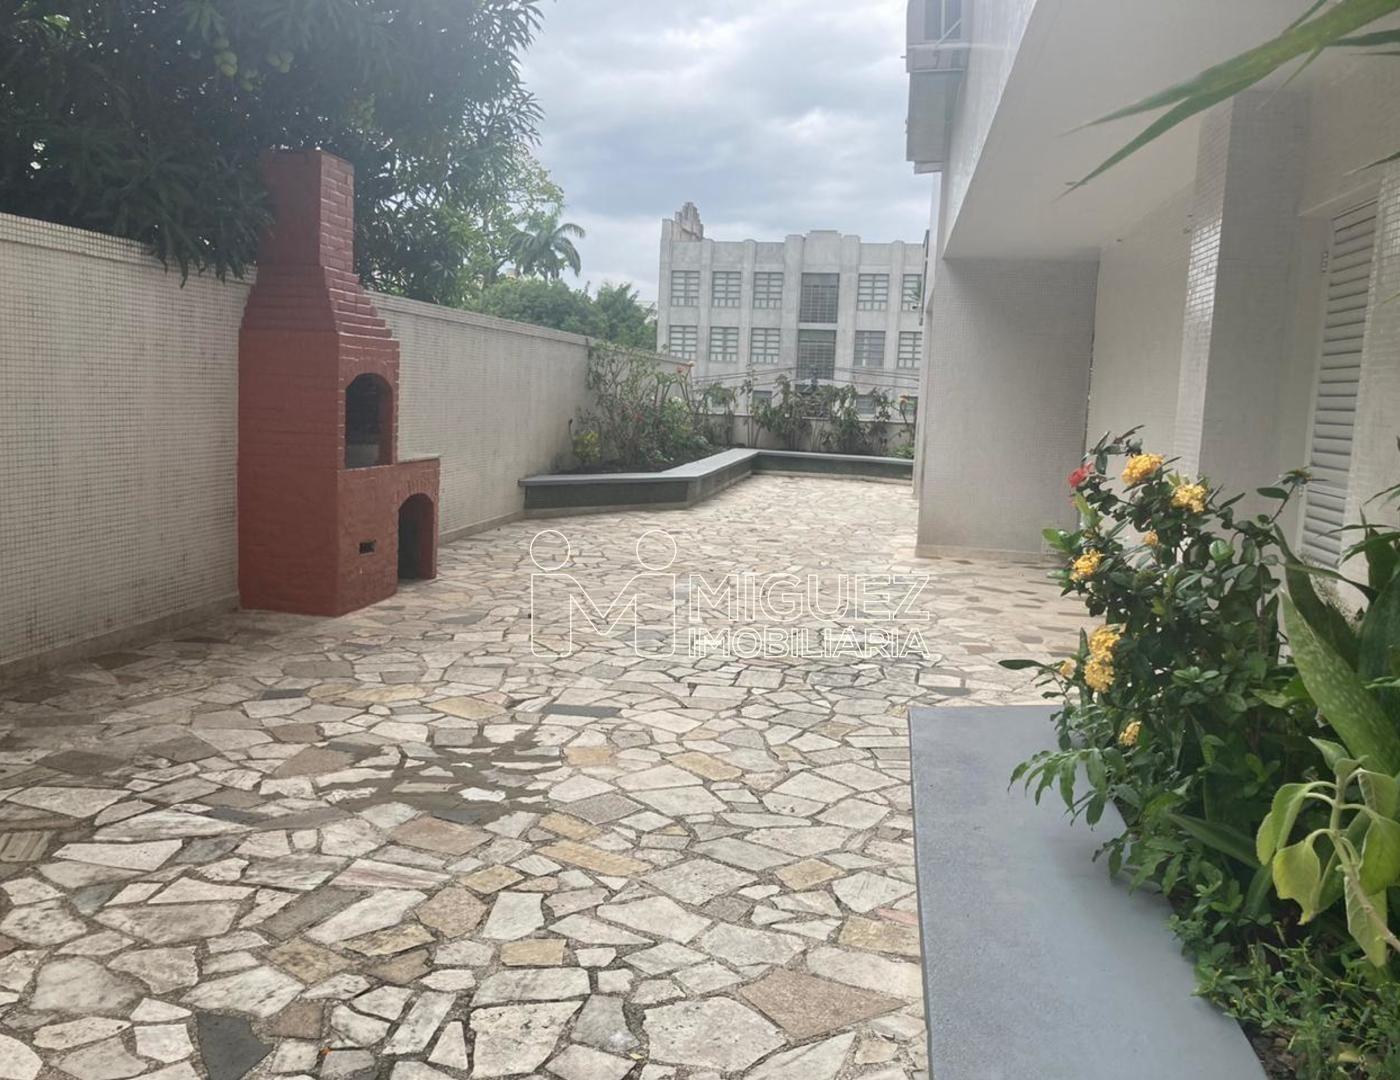 Apartamento, venda, Rua do Bispo - Tijuca , Rio de janeiro